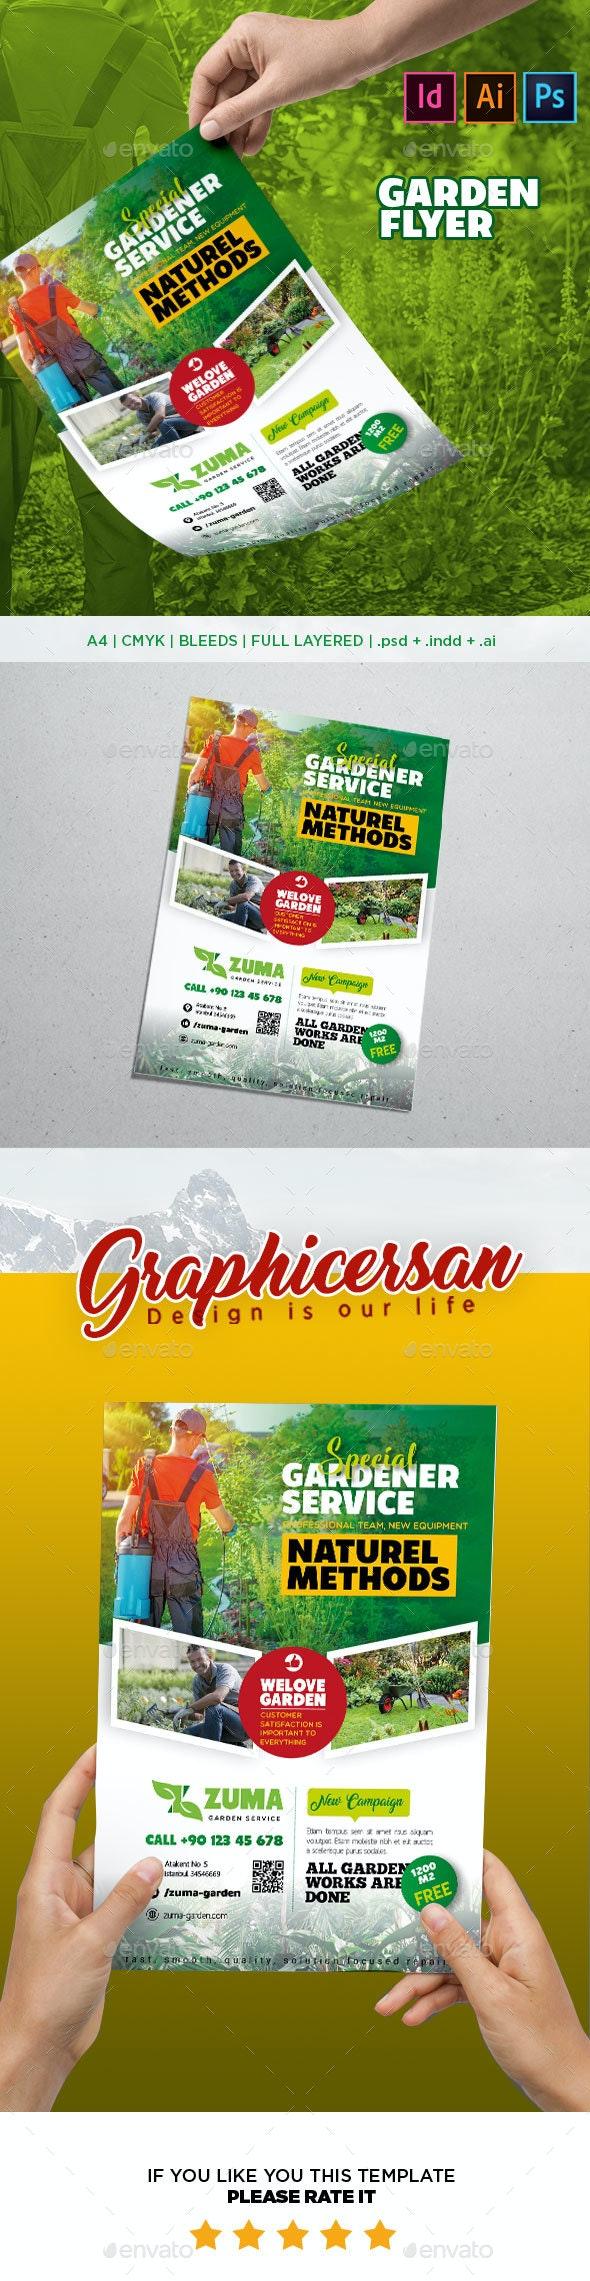 Garden Flyer Template - Corporate Flyers